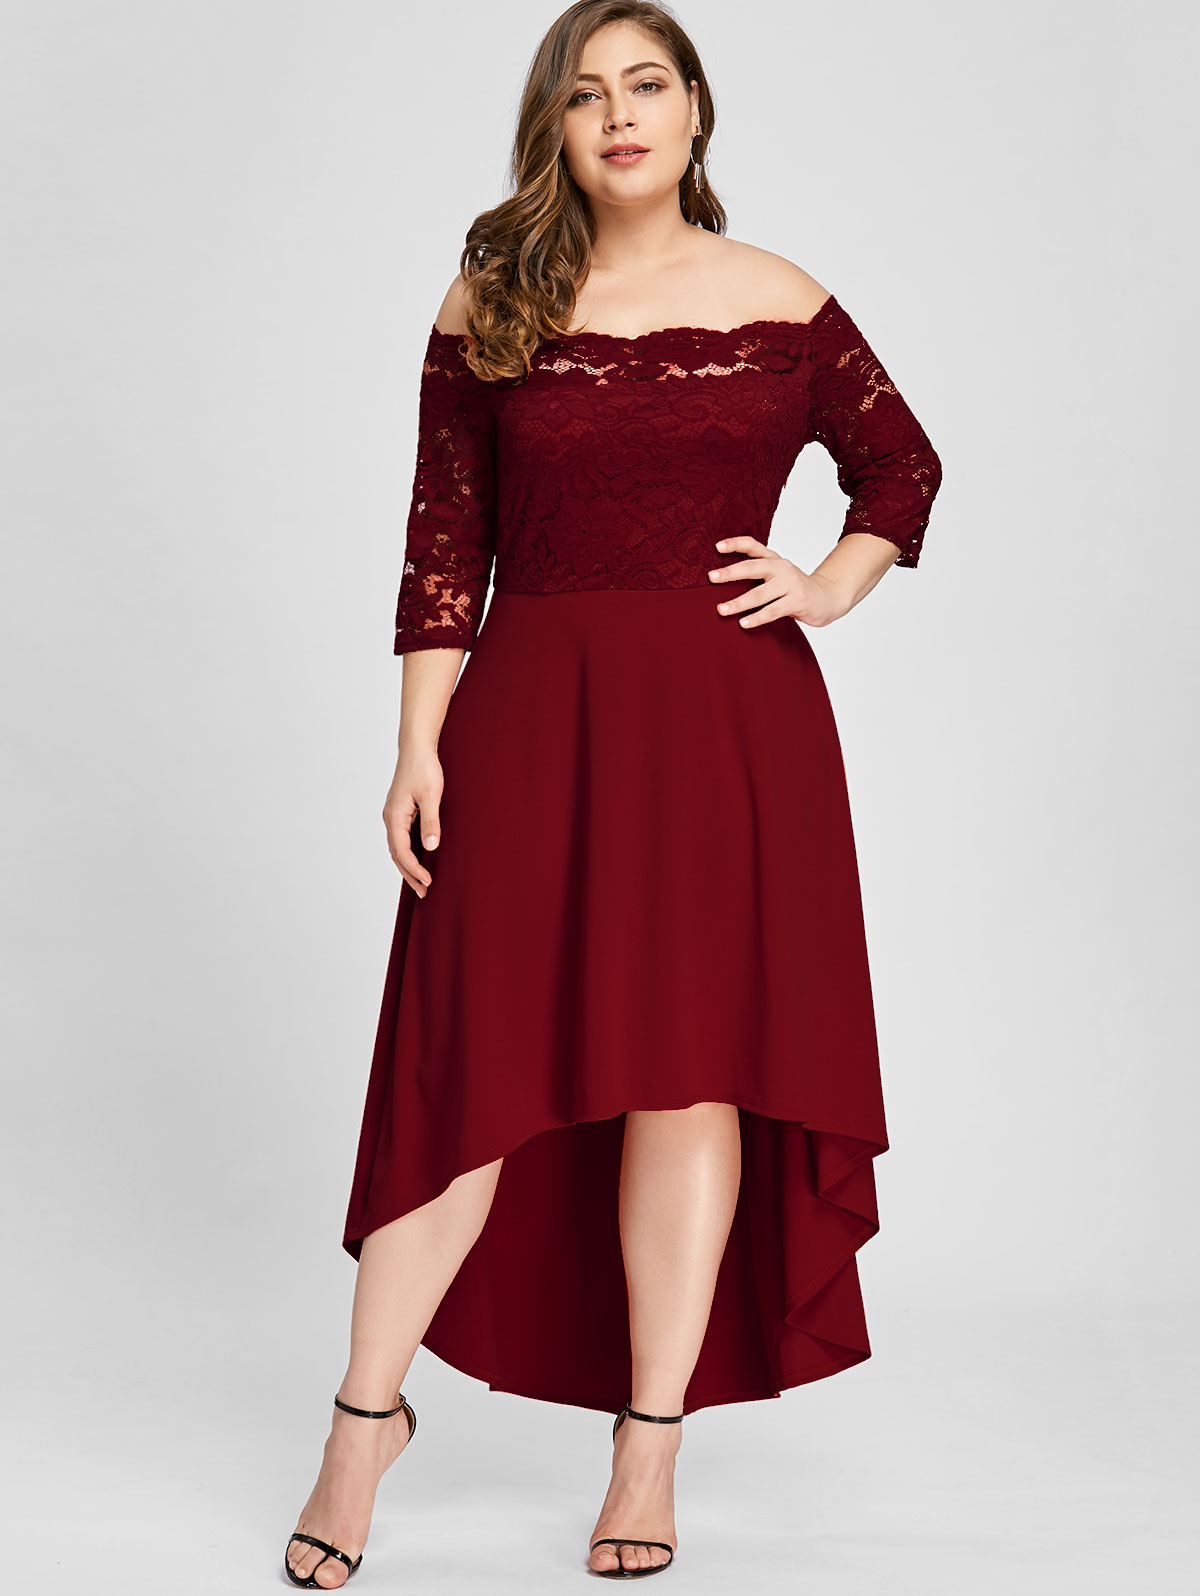 US $15.28 56% OFF|Wipalo Women Party Dress Plus Size Off Shoulder Dip Hem  Lace 3/4 Length Sleeves Dress Asymmetrical Elegant Vestidos Big Size 5XL-in  ...